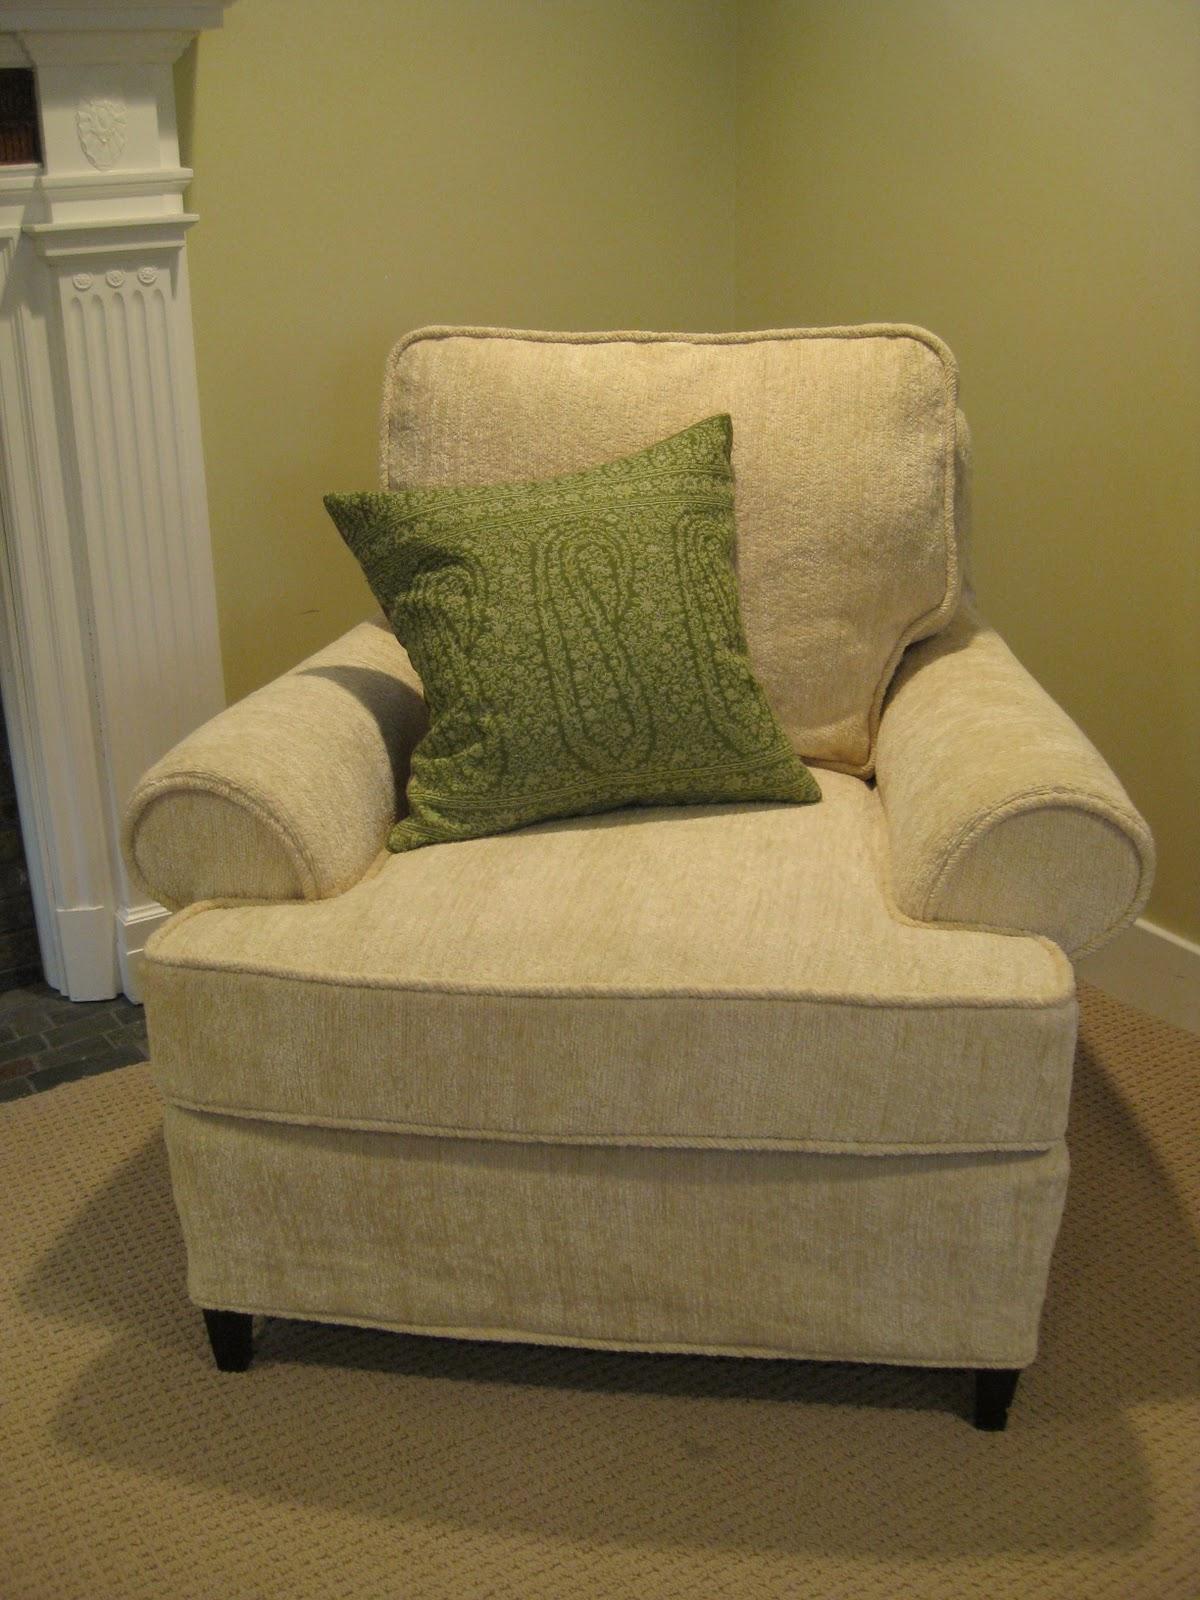 Club Chair Slipcover Folding In Rajkot Custom Slipcovers By Shelley